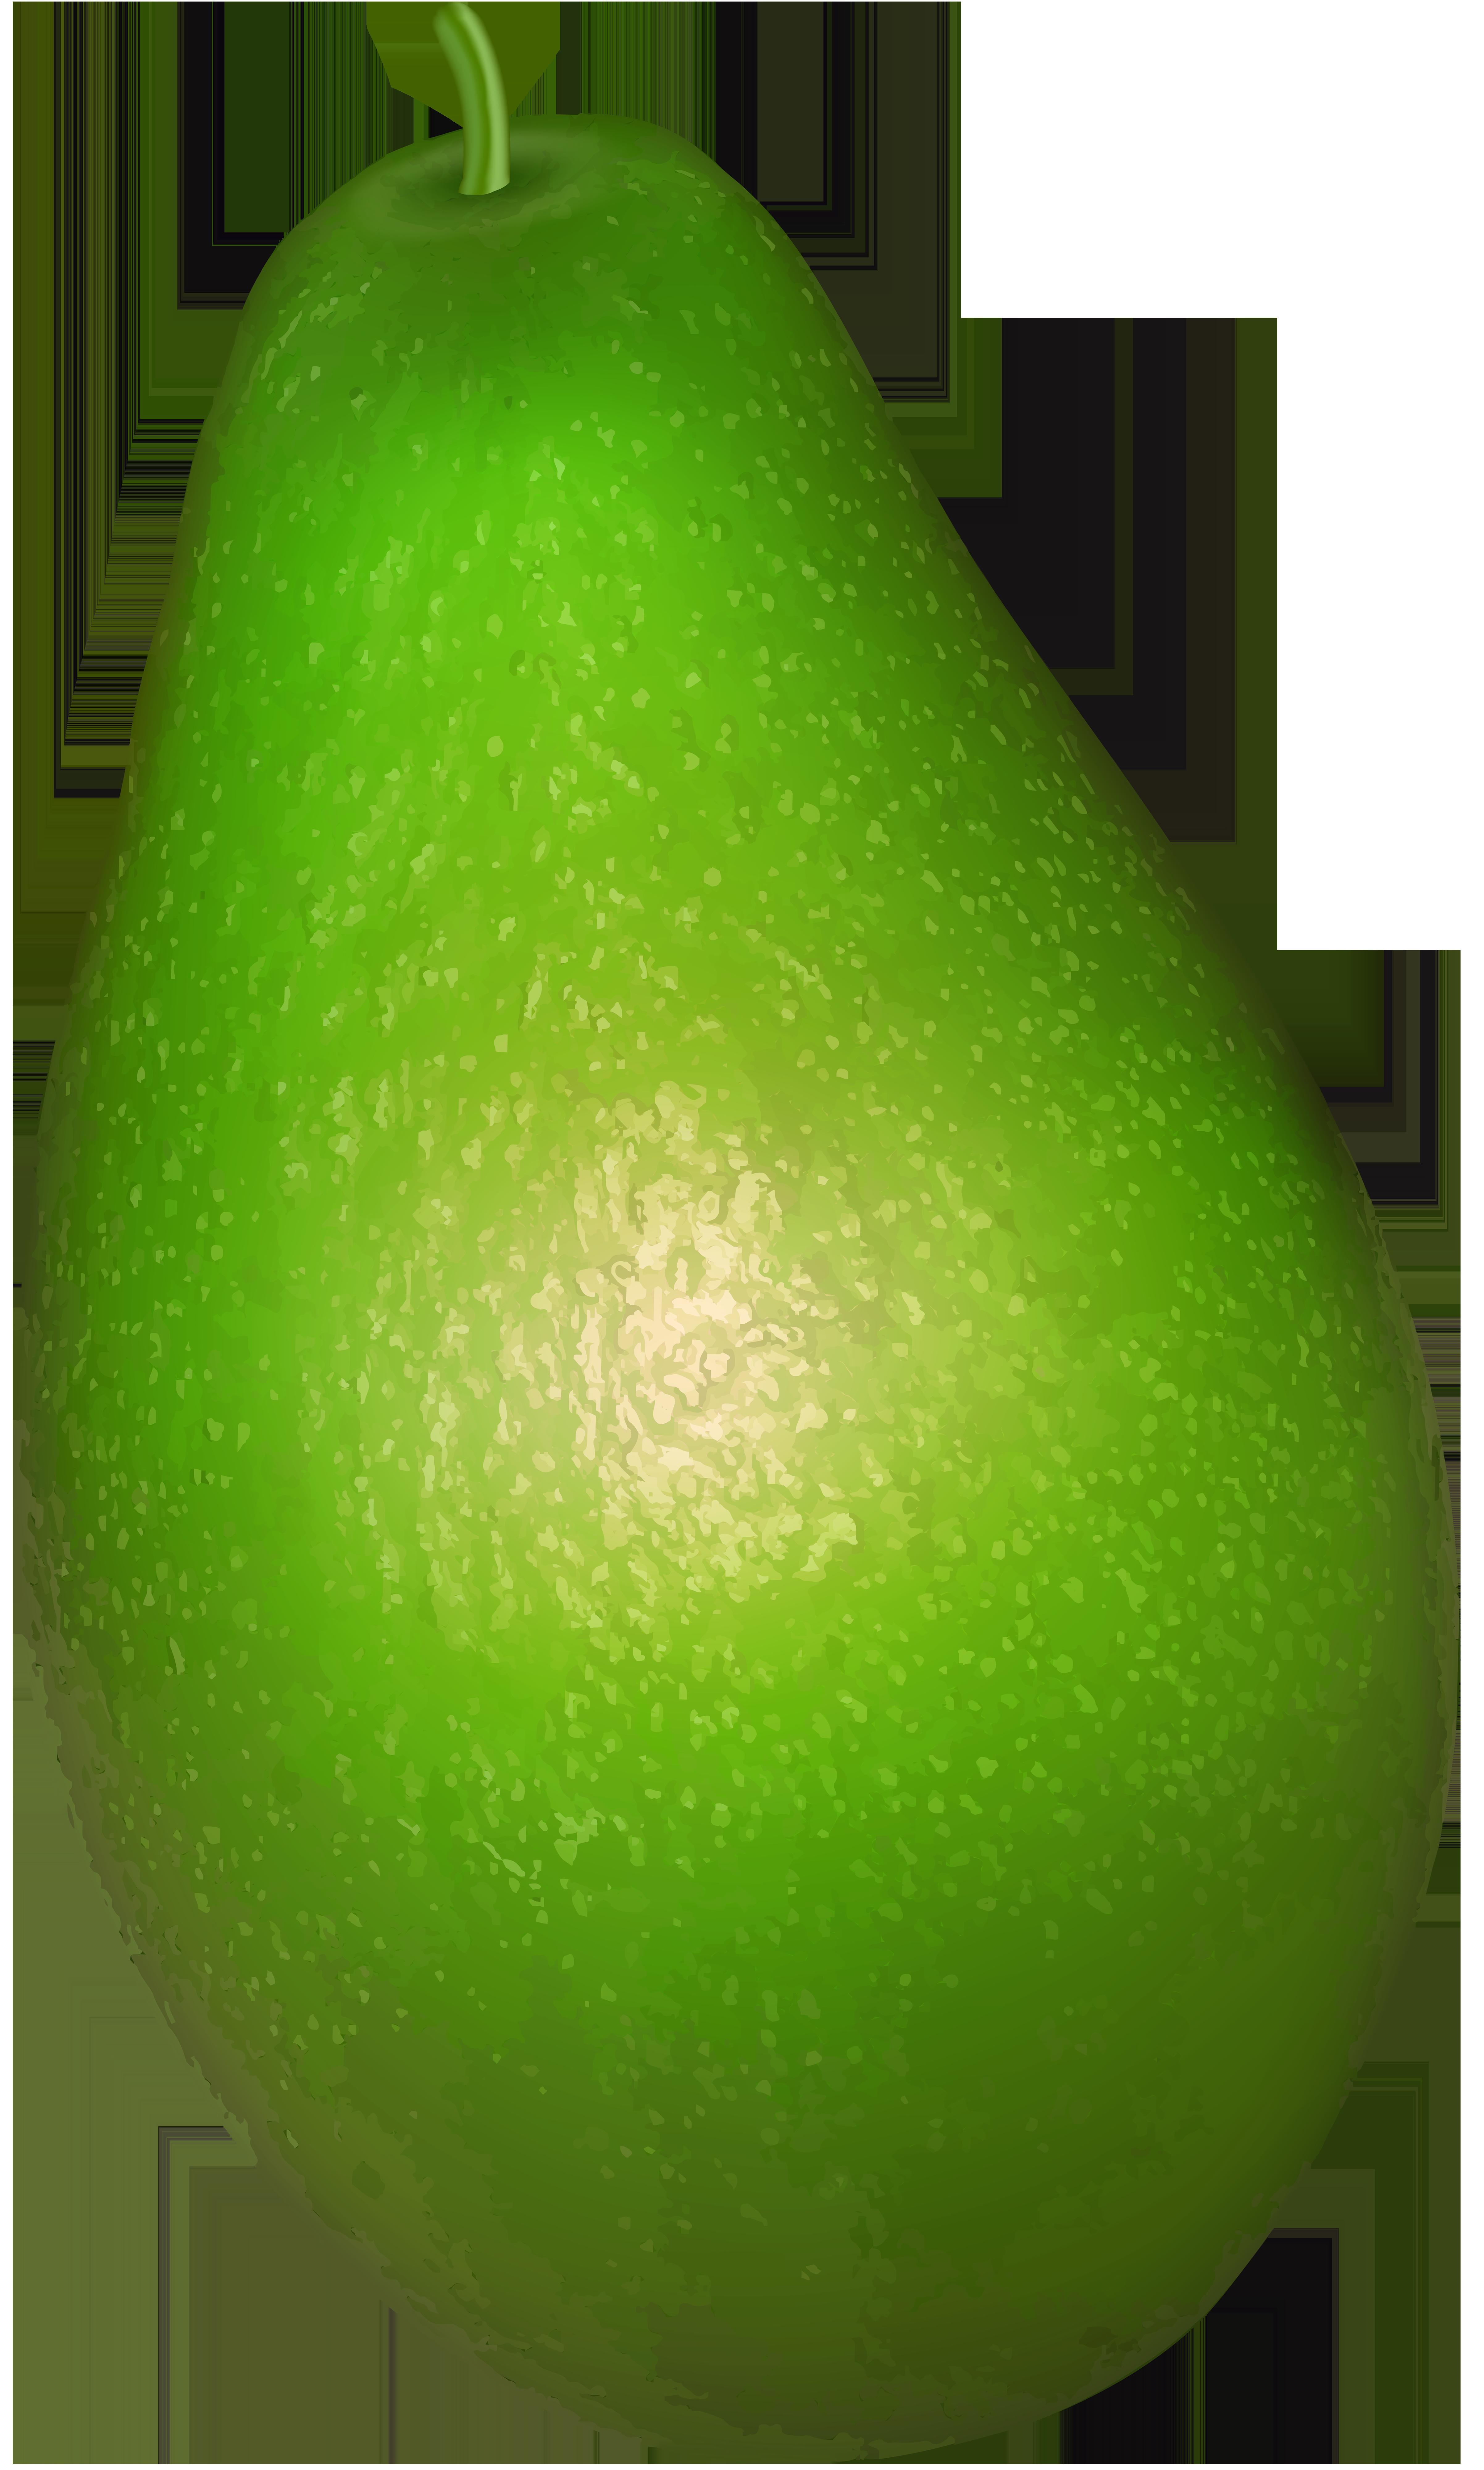 Avocado transparent png clip. Fruit clipart green fruit